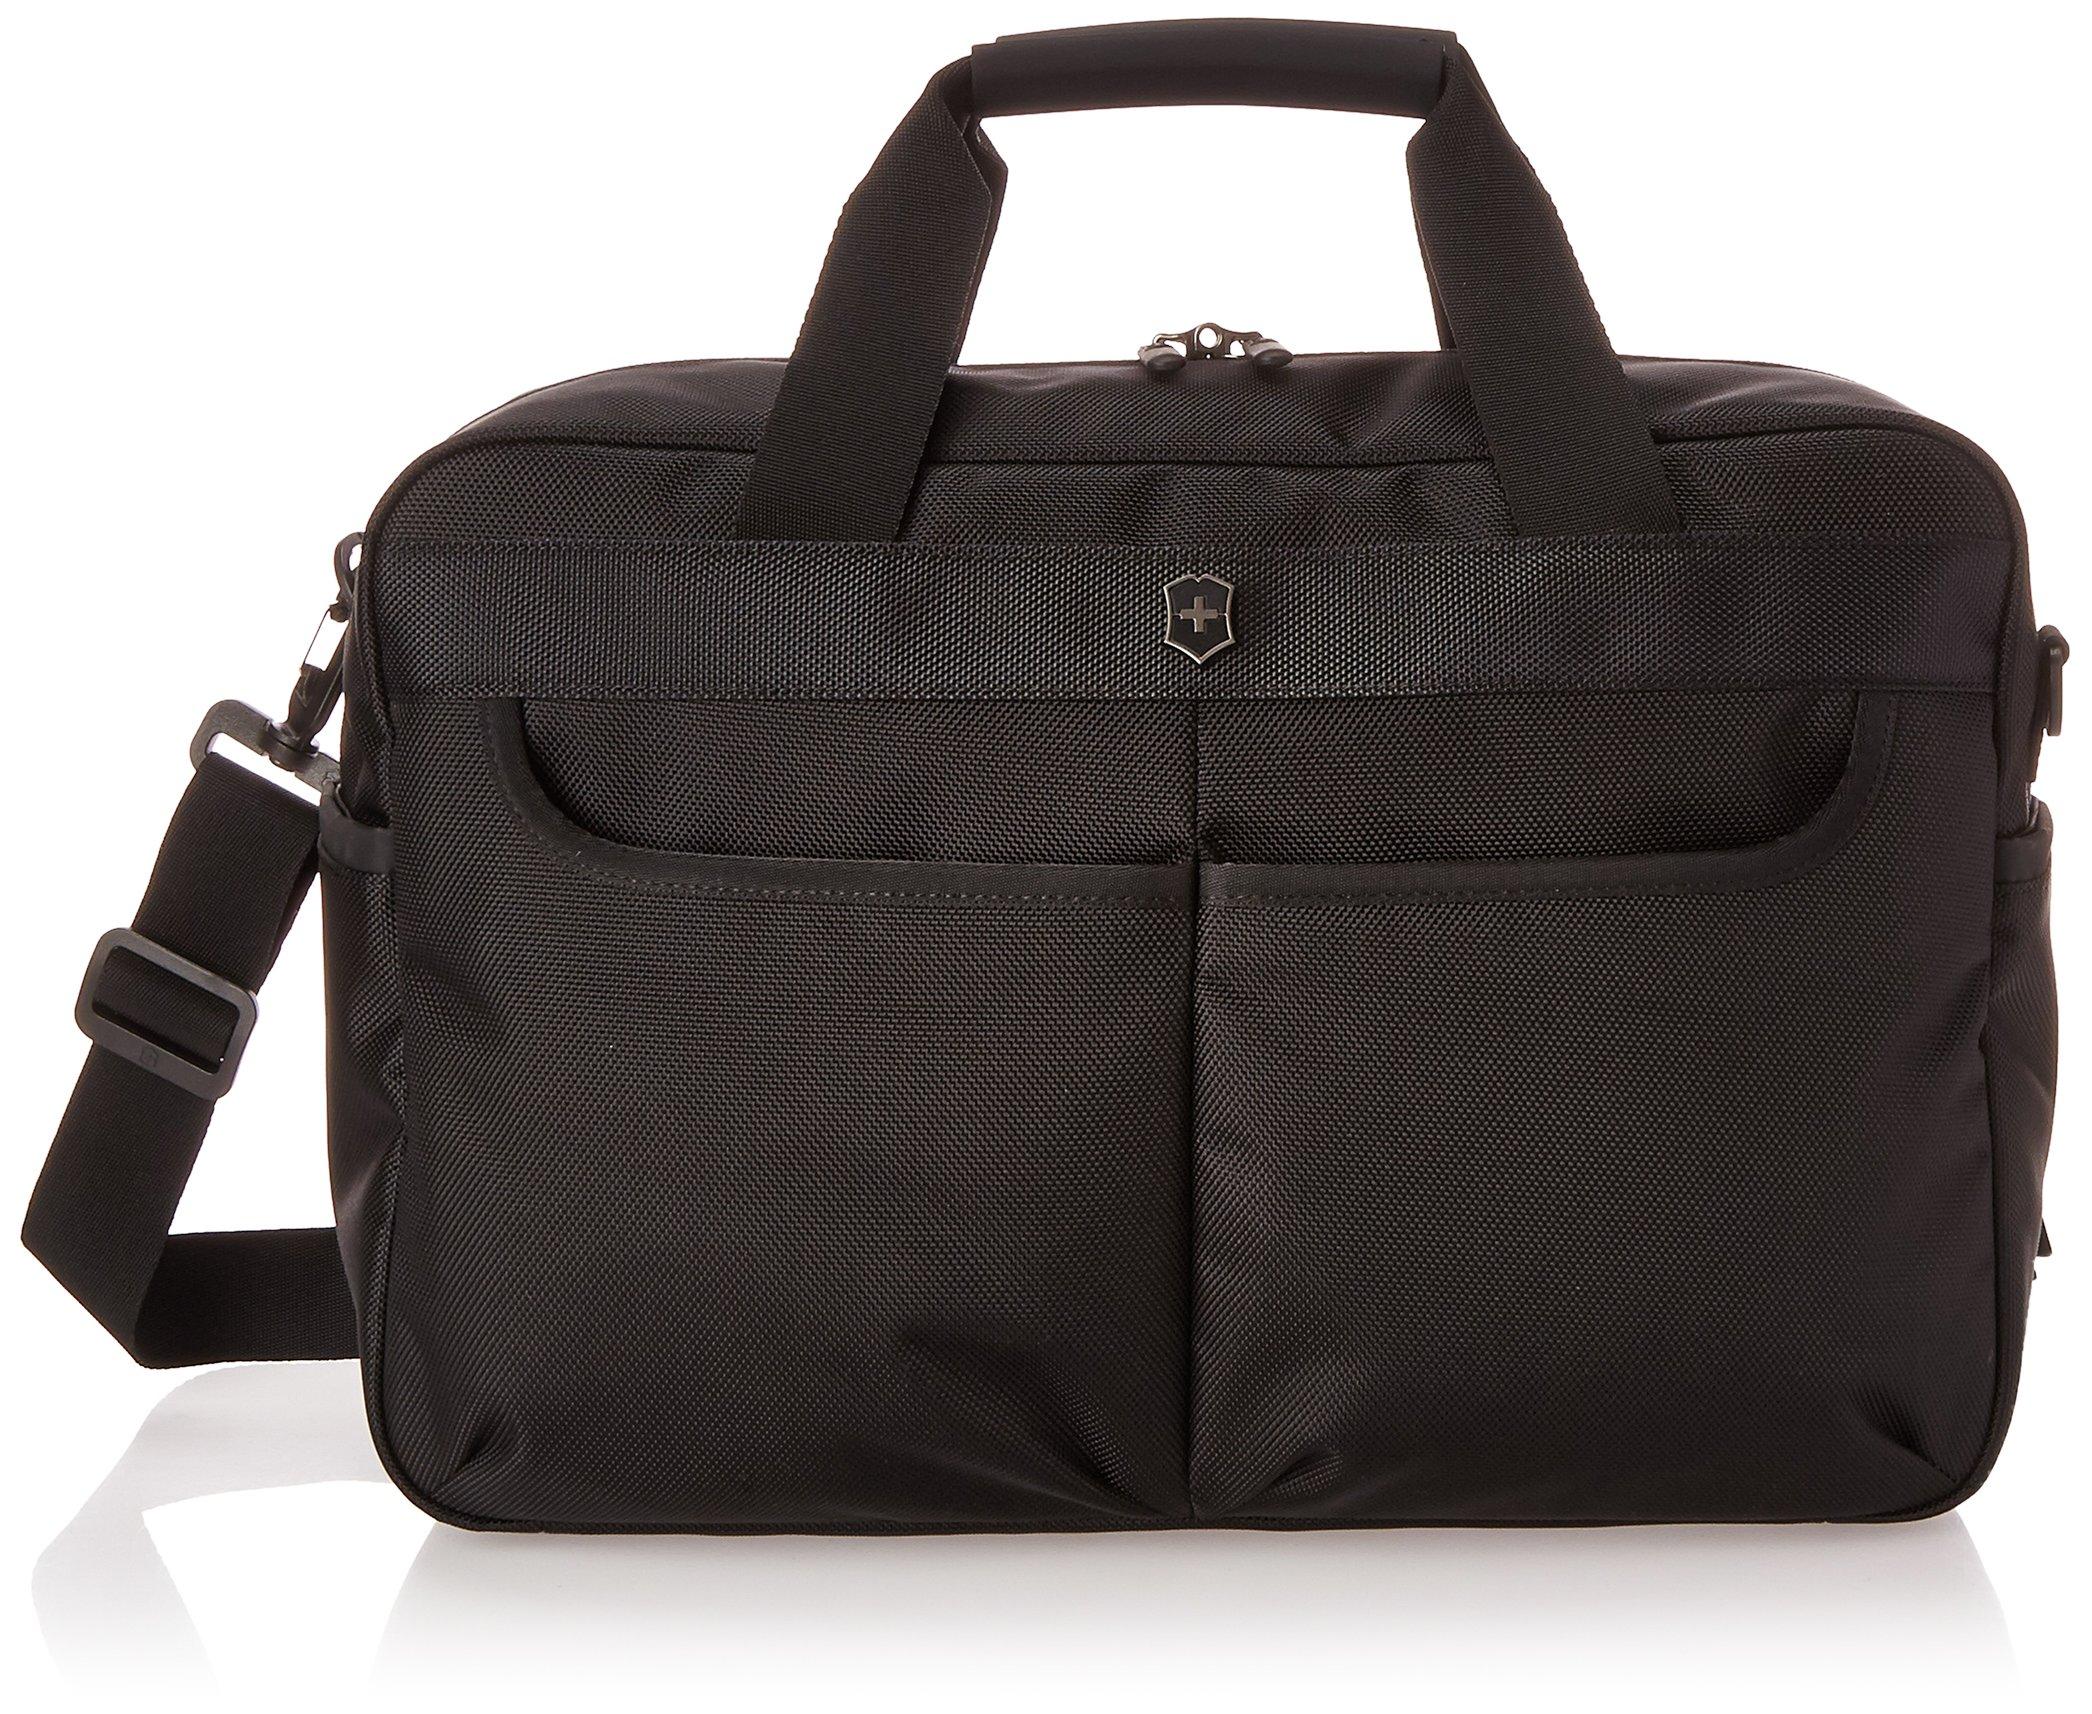 Victorinox Werks Traveler 5.0 WT Tote, Black, One Size